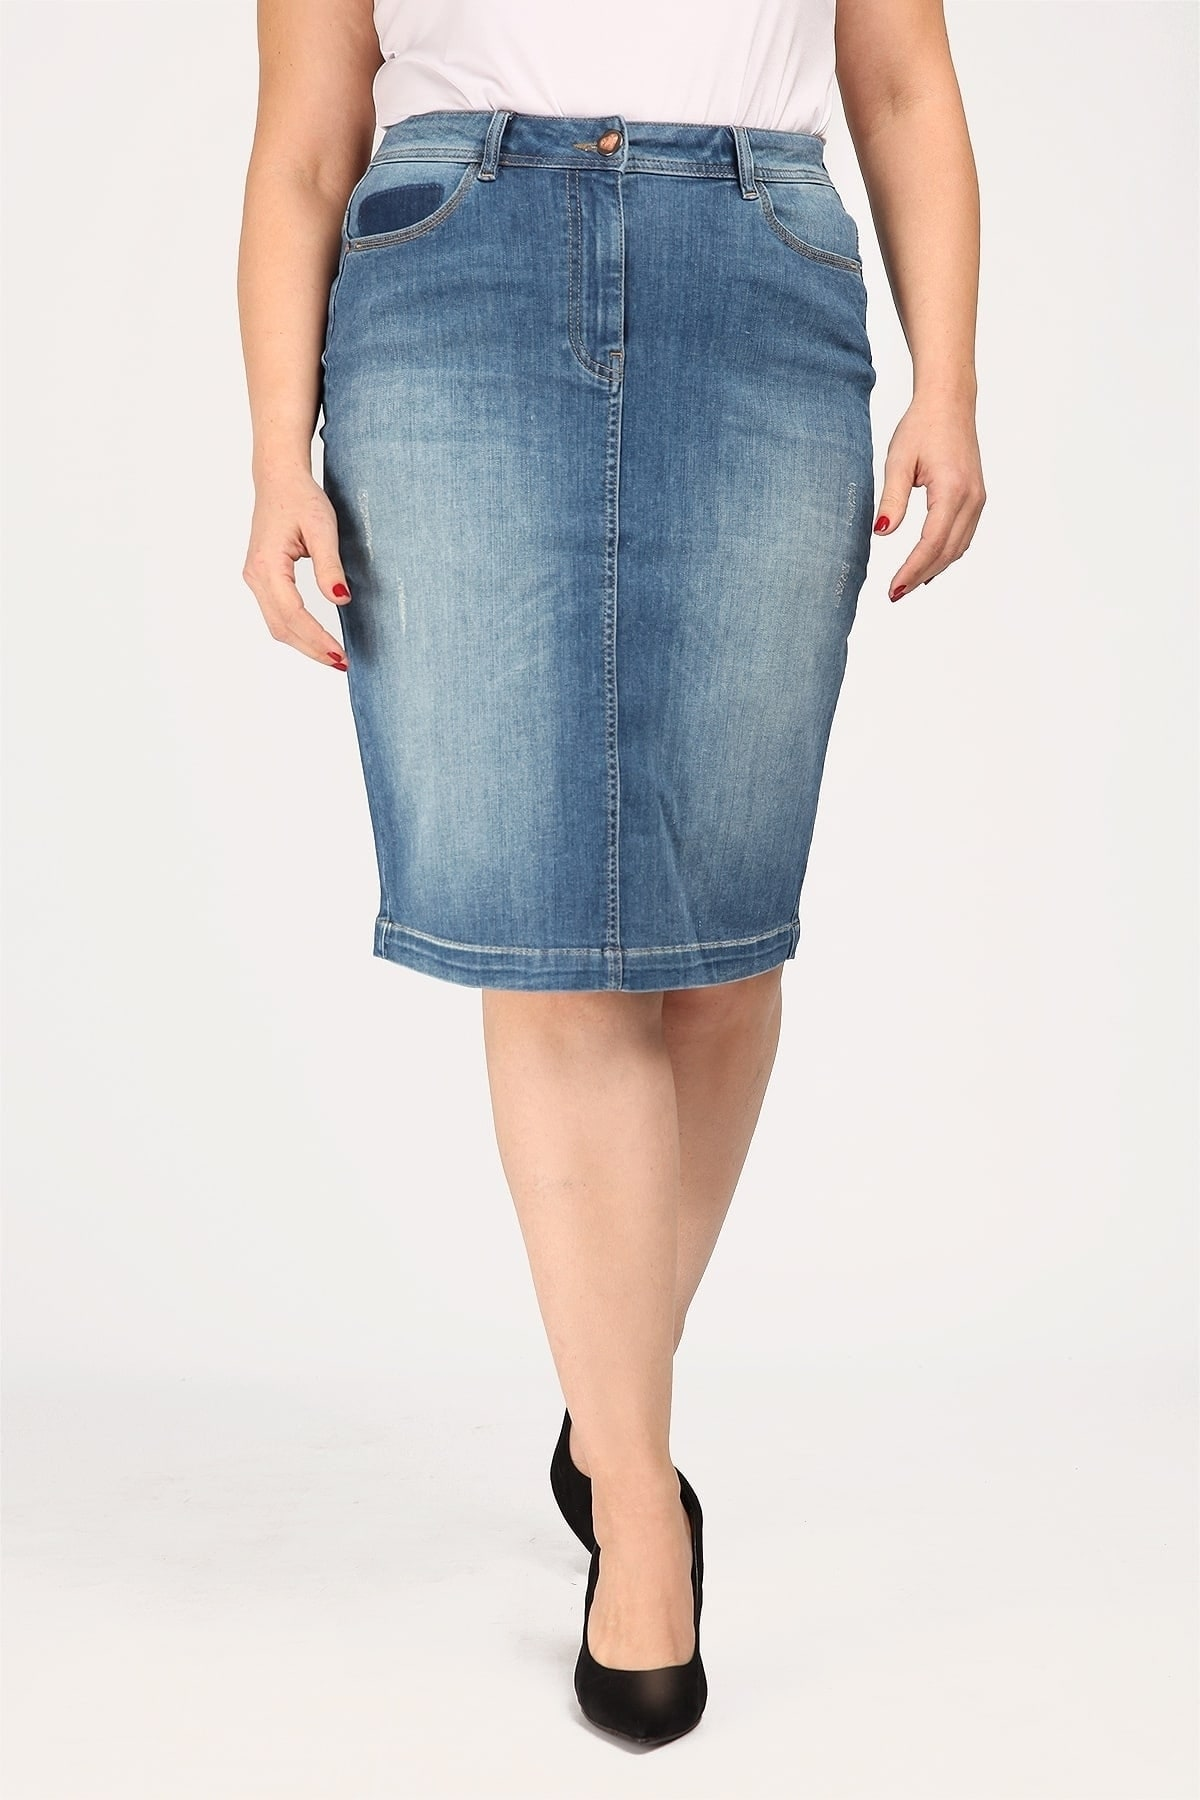 2f23248b775 SizePlusOnly   Γυναικεία Ρούχα Μεγάλα Μεγέθη   Parabita   foustes ...